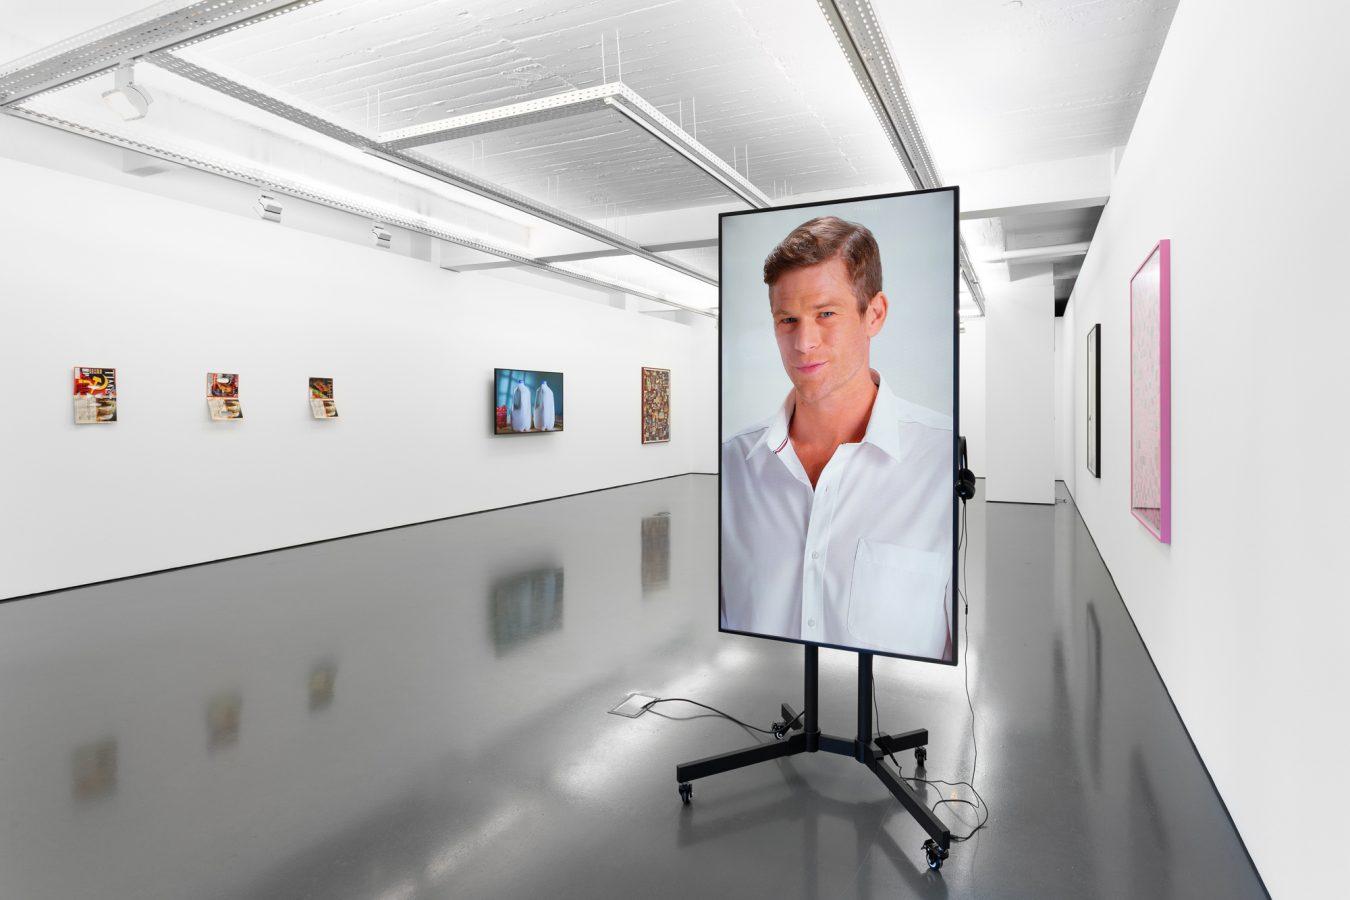 Galeria Pedro Cera – Matt Keegan - Recycle